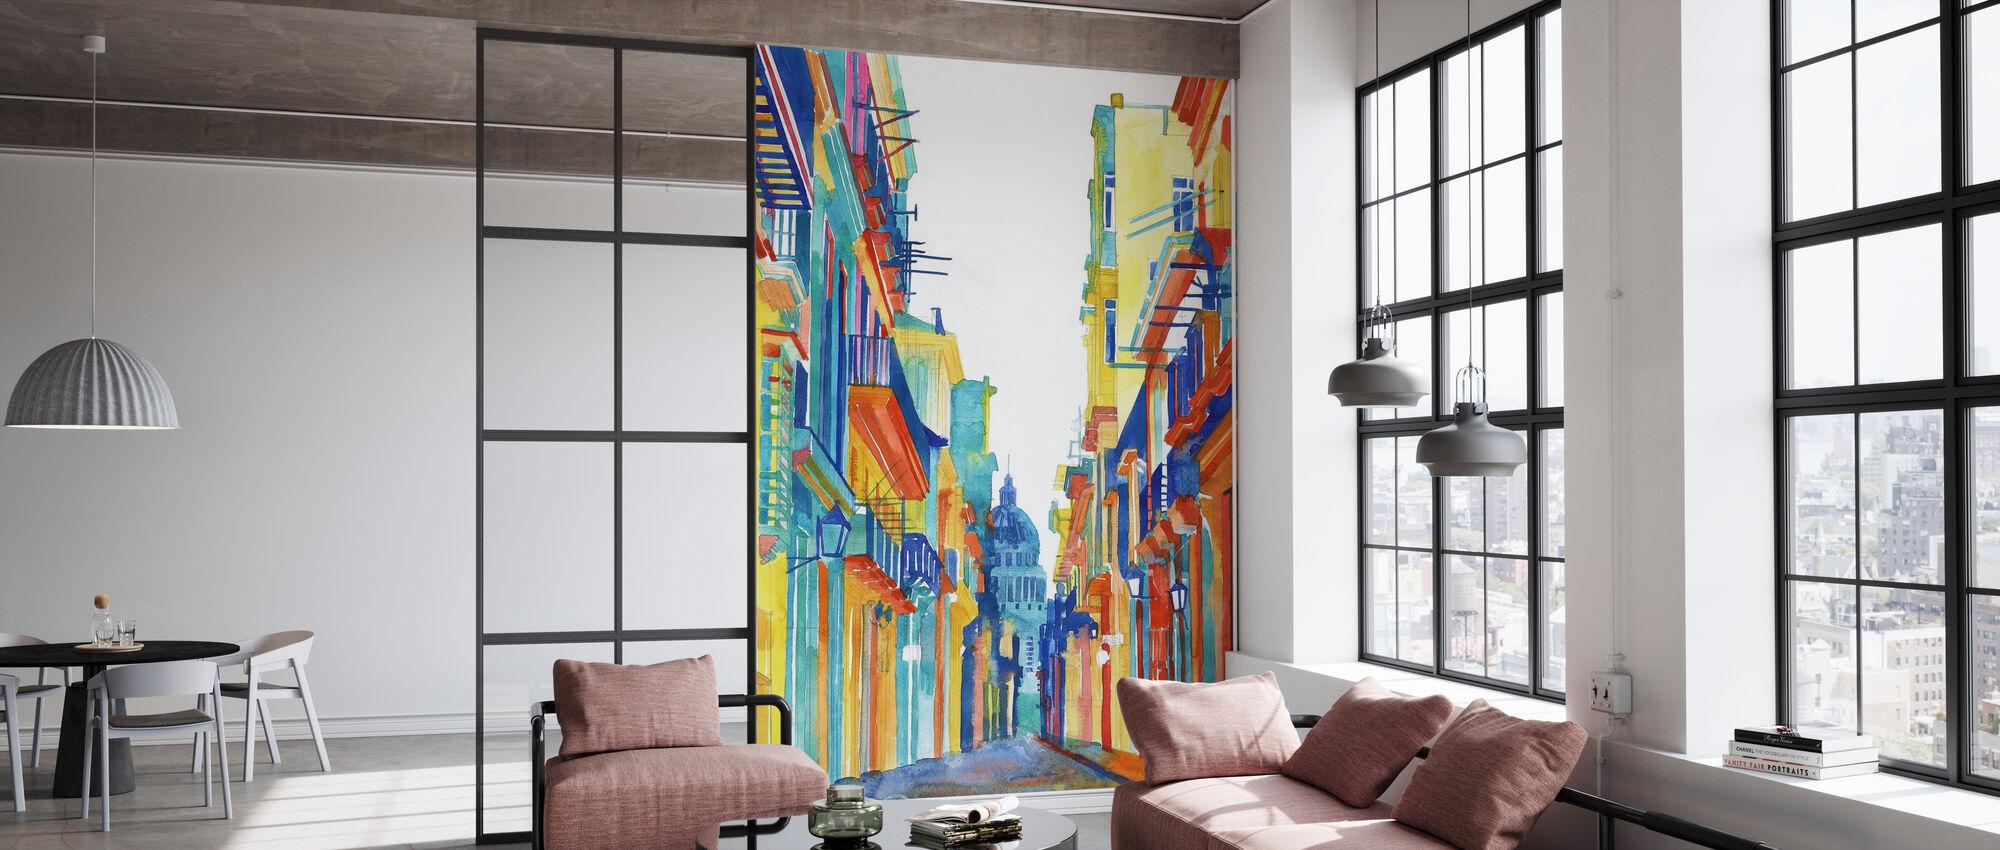 Havana Street - Wallpaper - Office